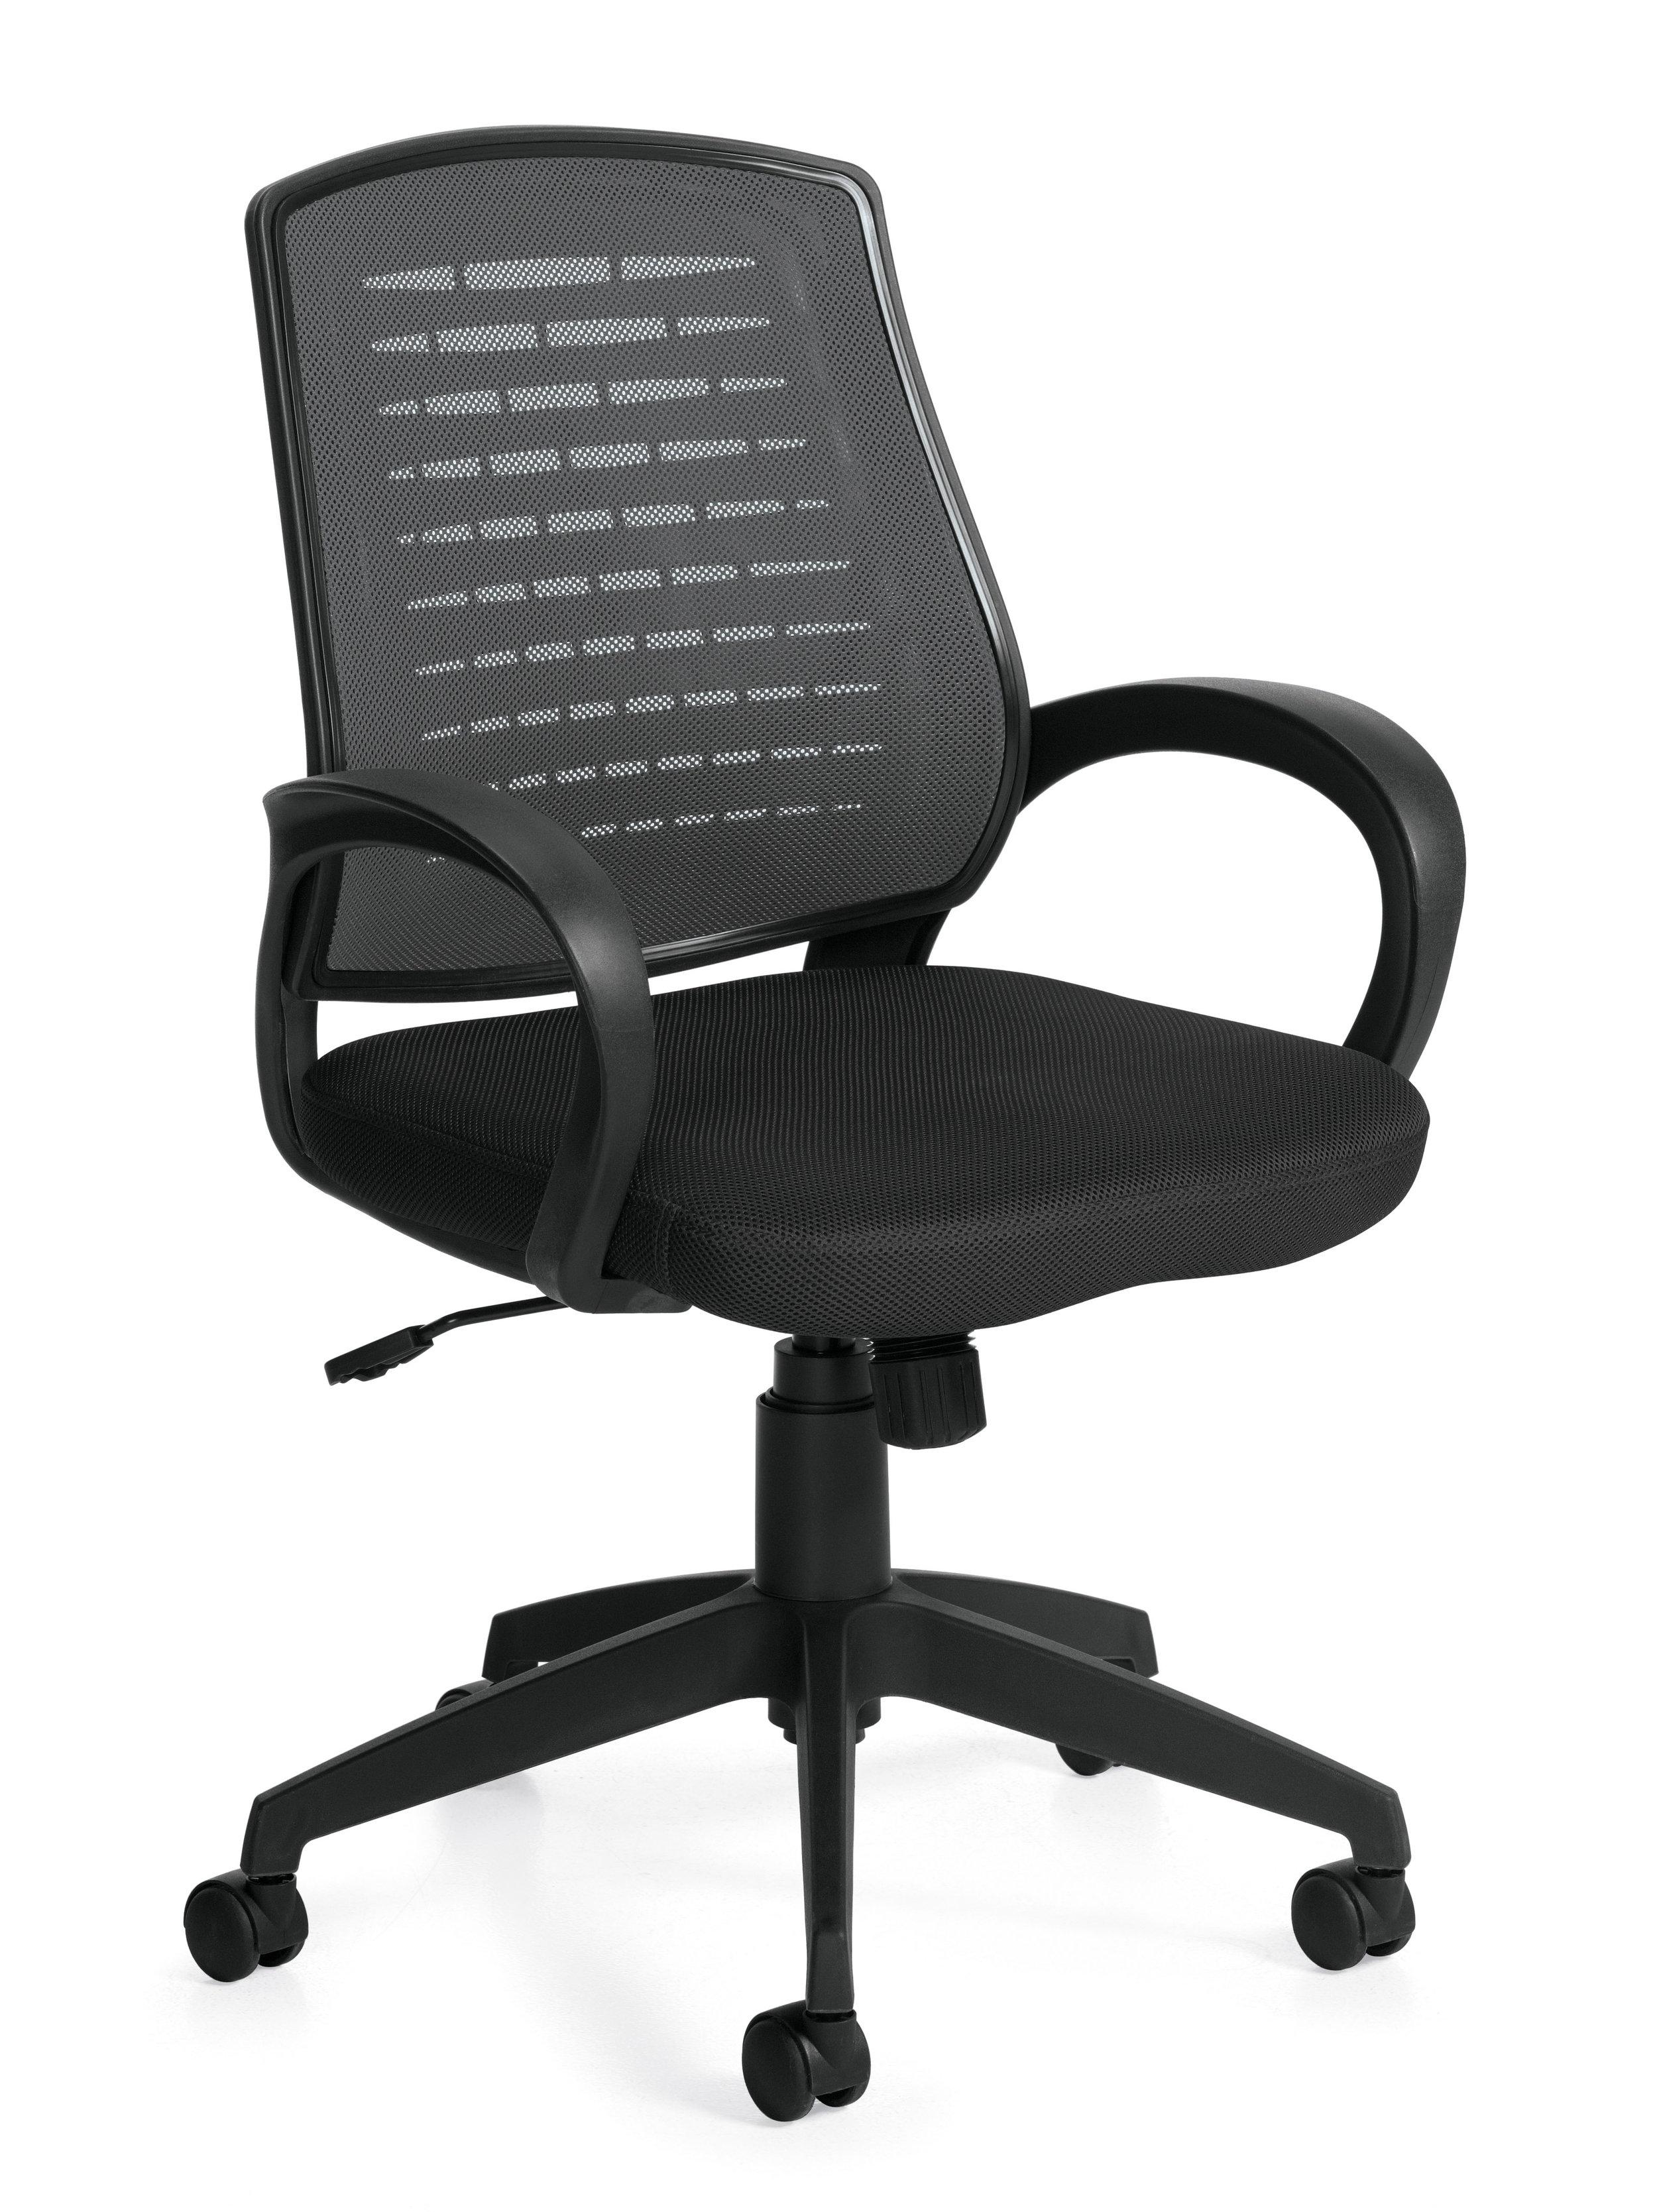 OTG10902B Mesh Back Managers Chair.jpg